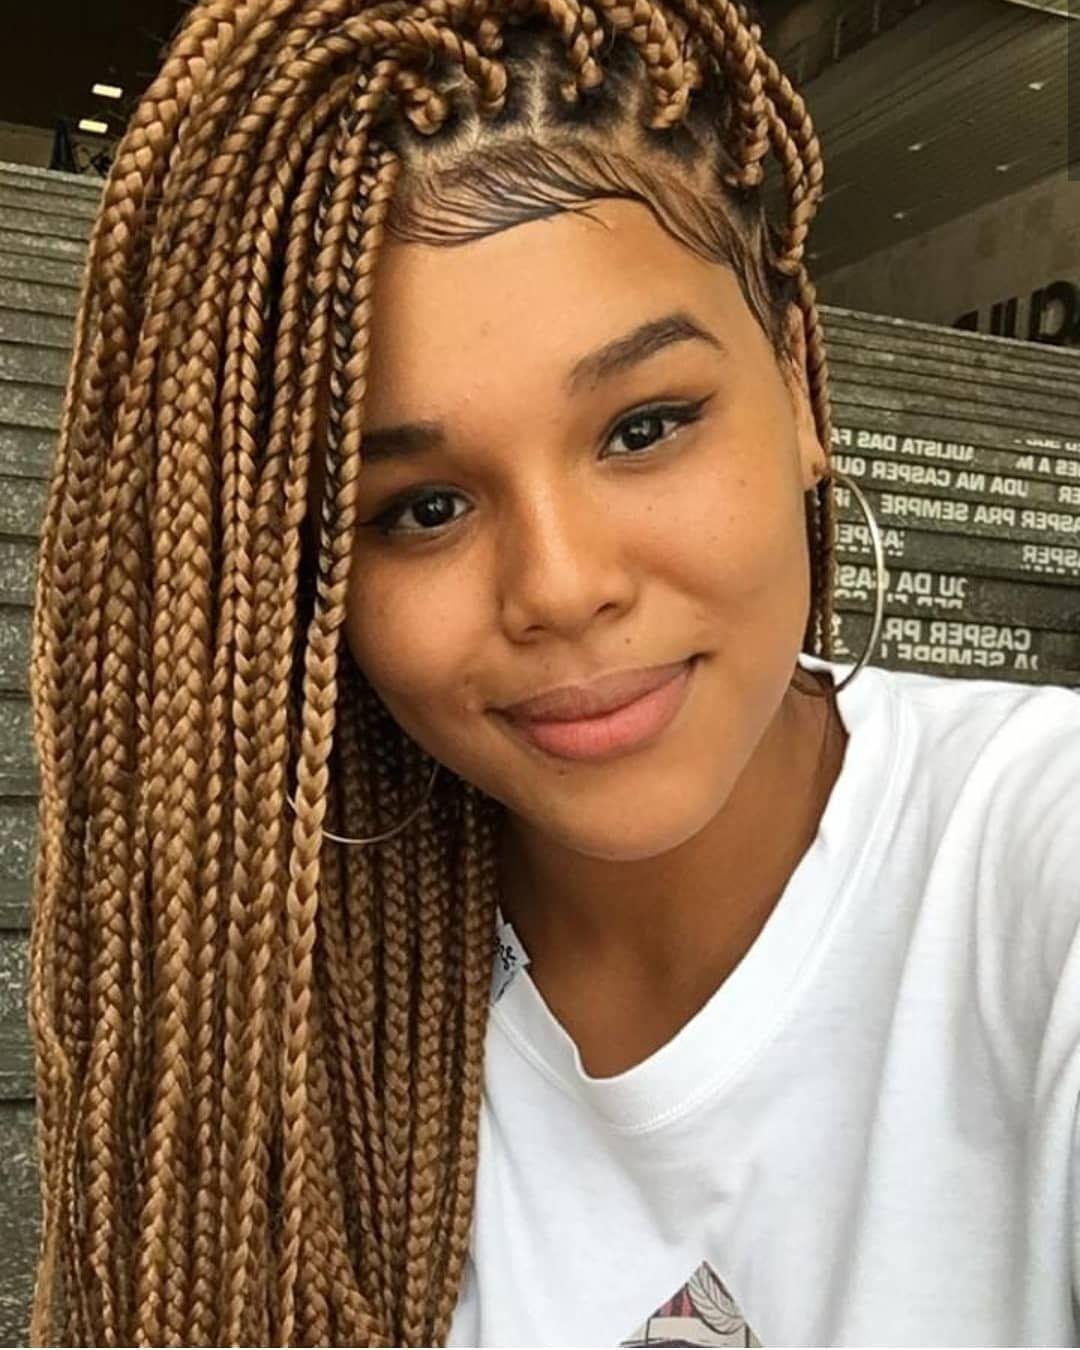 Box Braids Hairstyles For African American Black Women And White Women Box Braids Medium Box Braids Sho Hair Styles Braided Hairstyles Box Braids Hairstyles